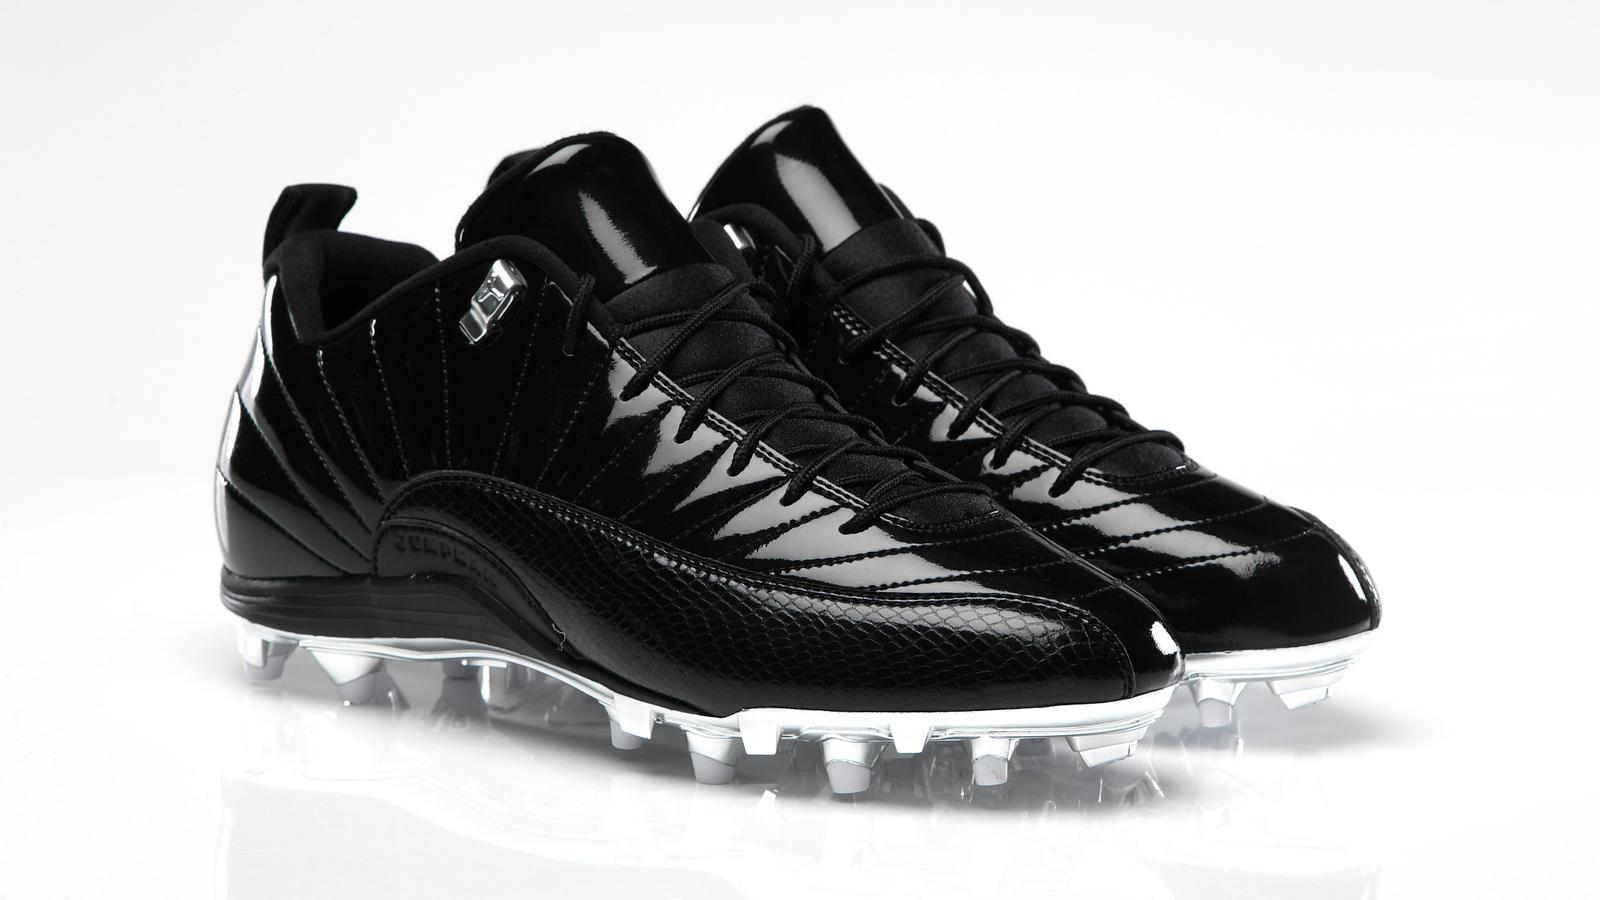 Jordan Brand Football Athletes To Wear Air Jordan Xii Cleats